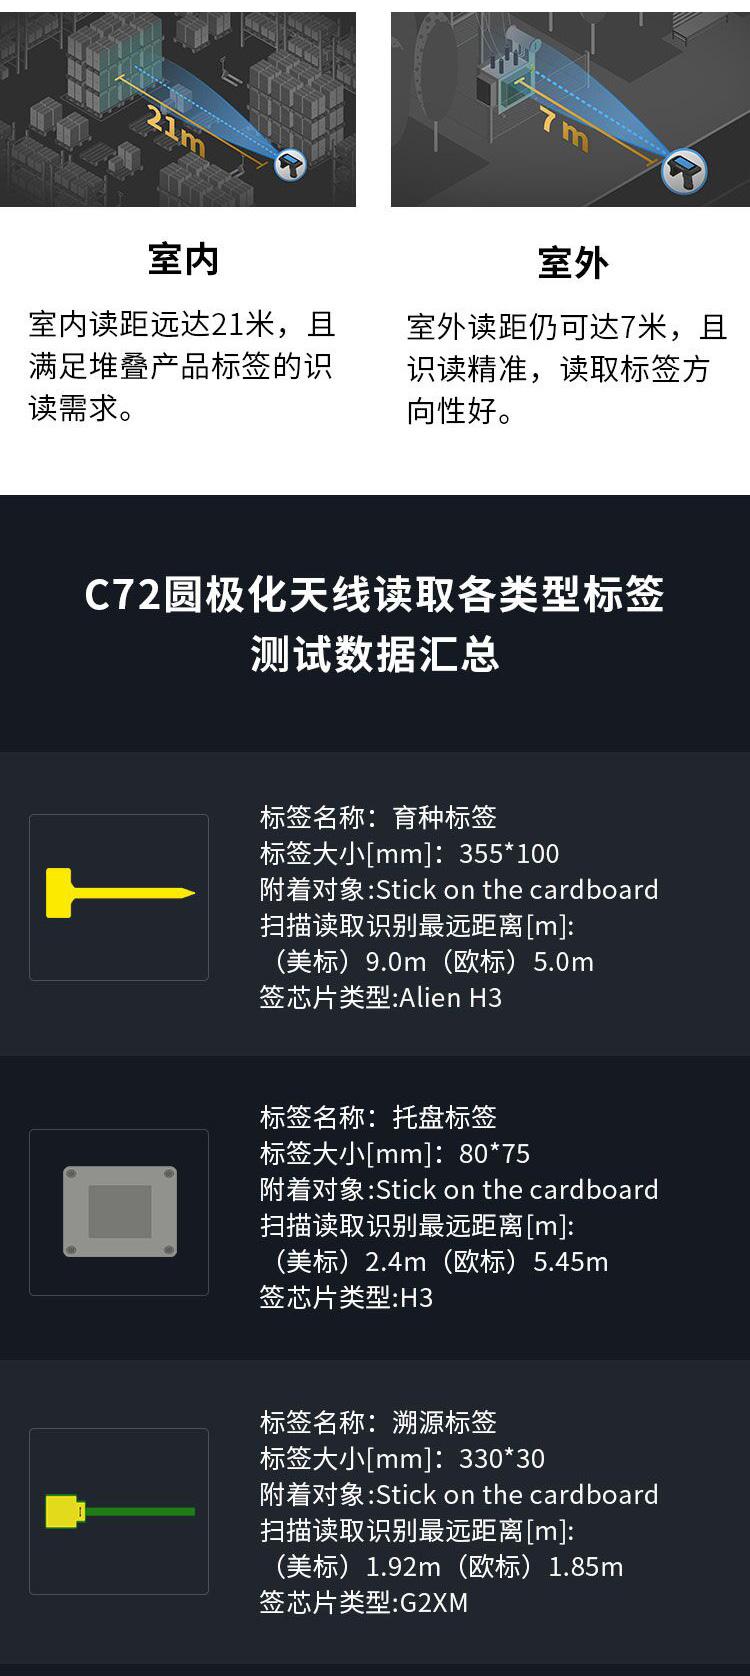 UHF 智能手持终端C72